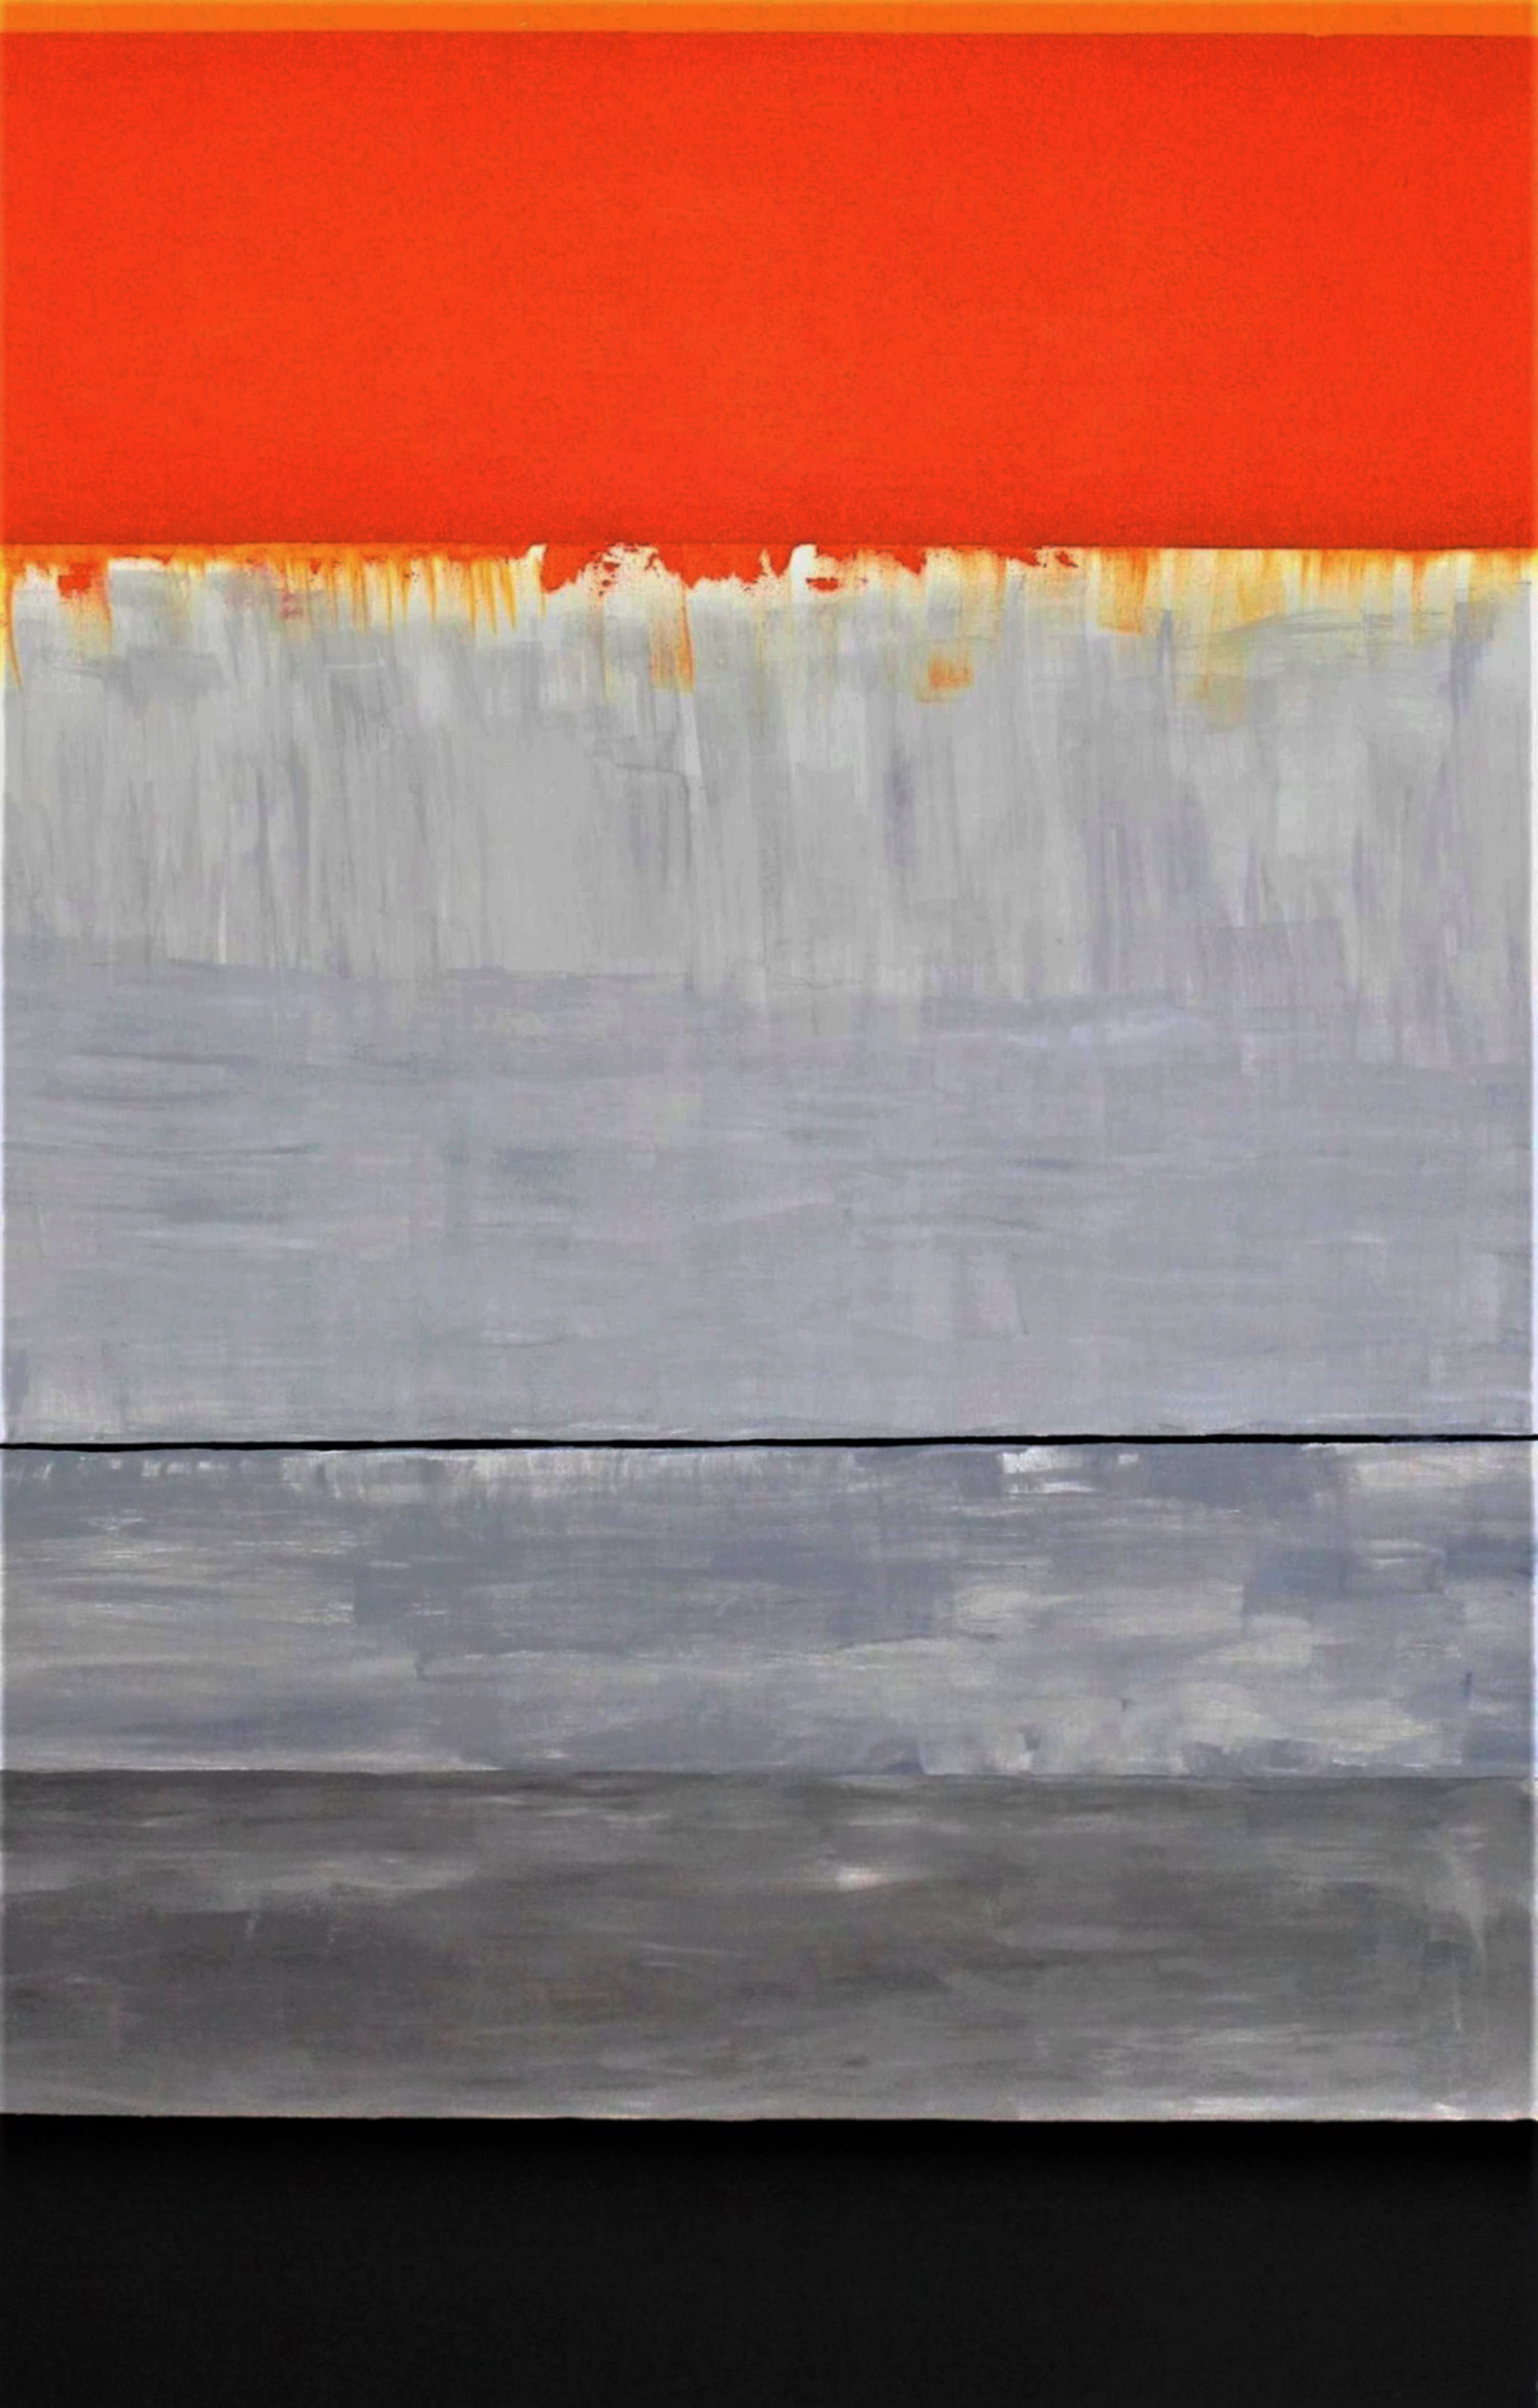 MORNING RISING artwork by Wes Wheeler - art listed for sale on Artplode